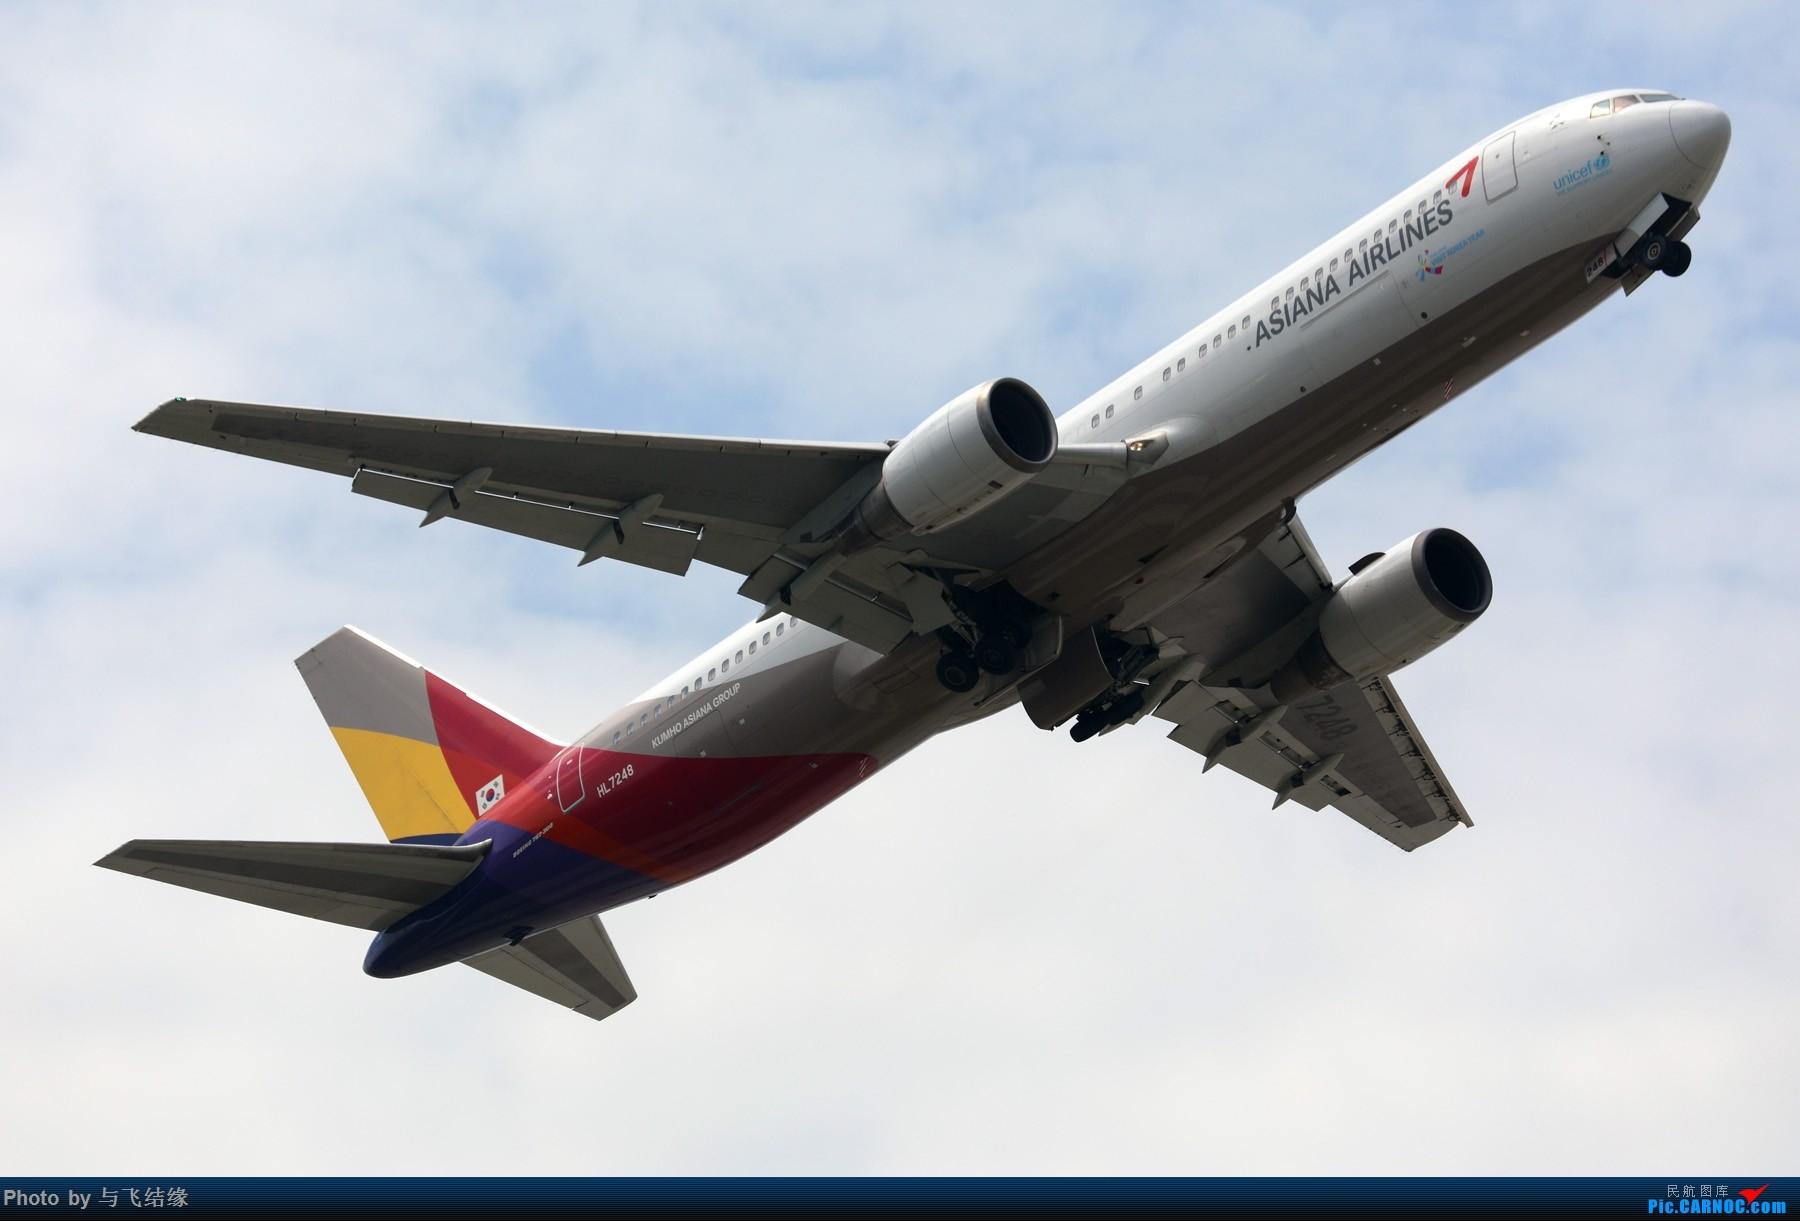 Re:[原创]越来越少的机型Boeing 767,韩亚航空公司Boeing 767组照! BOEING 767 HL-7248 中国北京首都国际机场